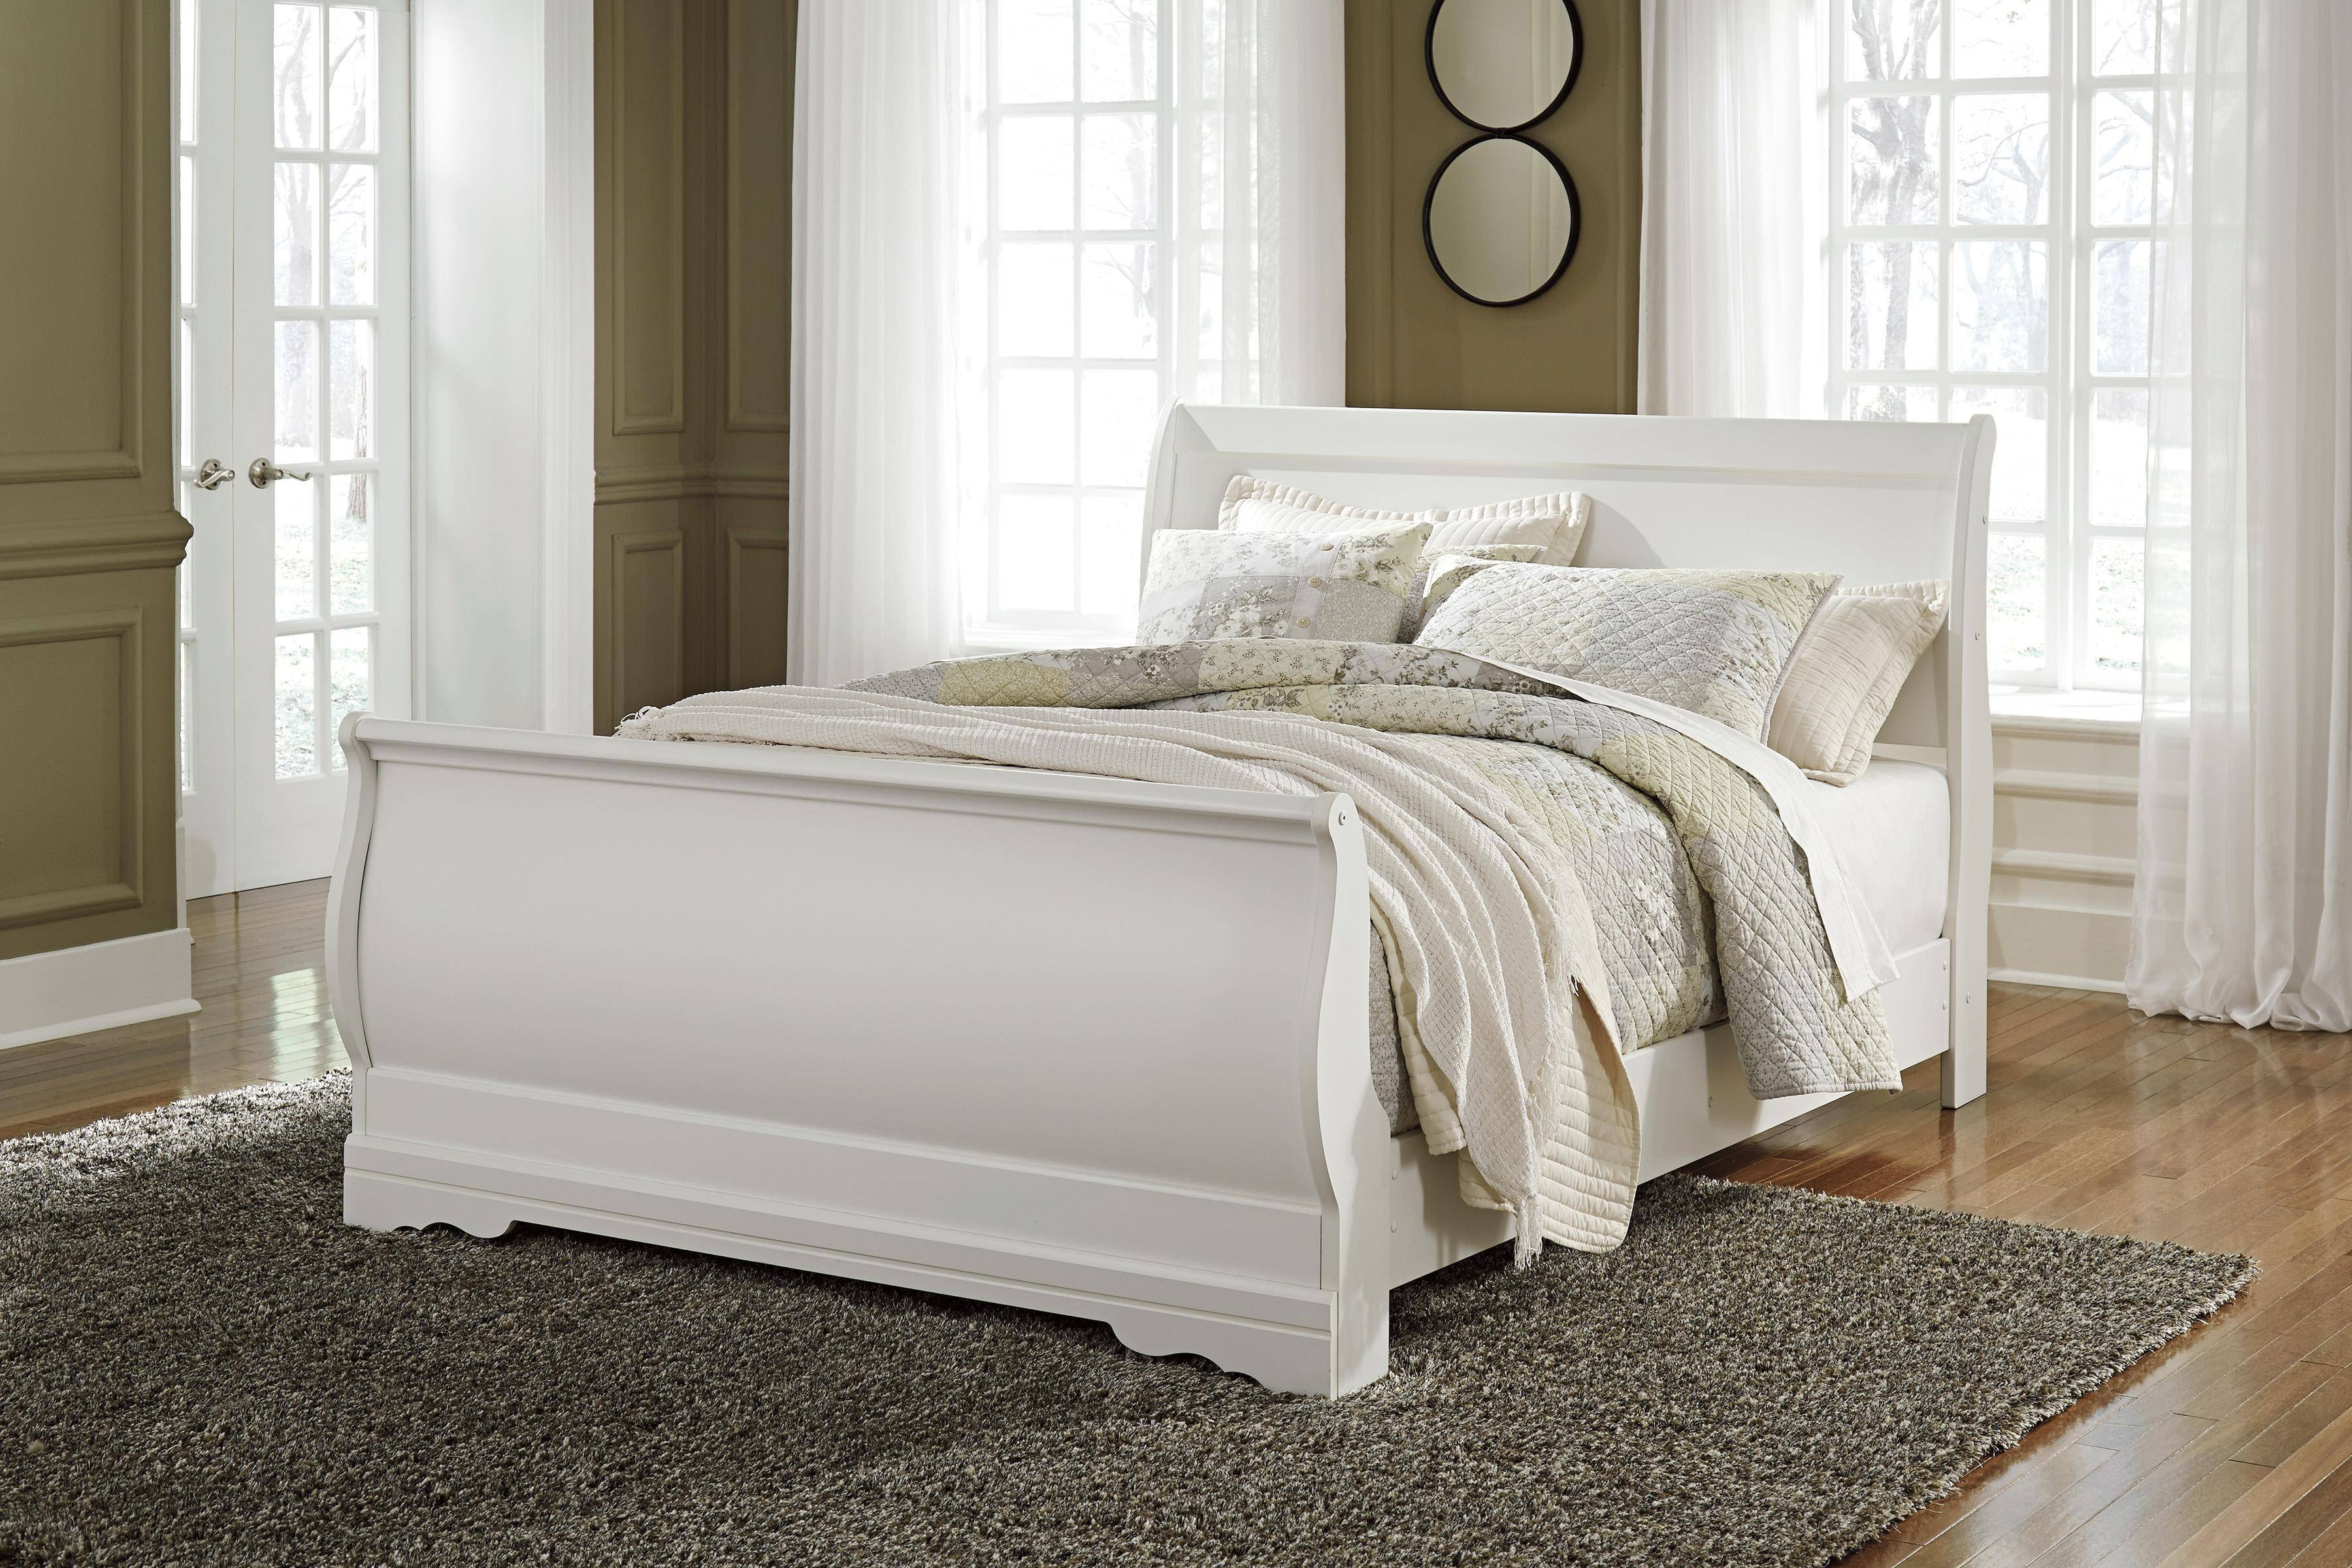 Ashley Furniture Queen Size Bedroom Set Best Of ashley Anarasia B129 Queen Size Sleigh Bedroom Set 5pcs In